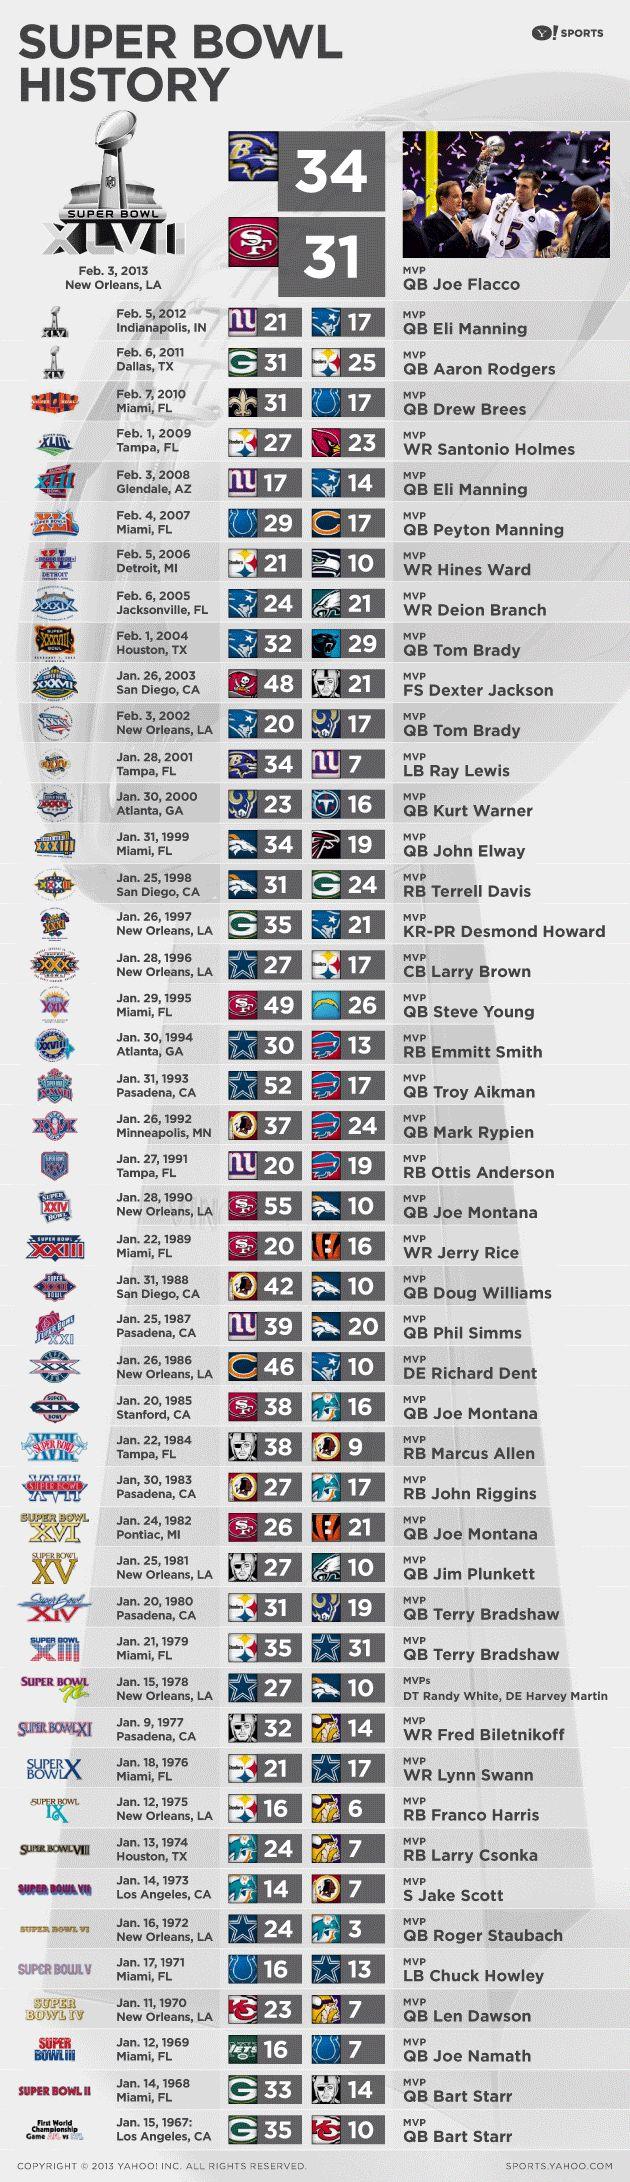 Super Bowl History - http://sports.yahoo.com/news/nfl--super-bowl-history-041316699.html